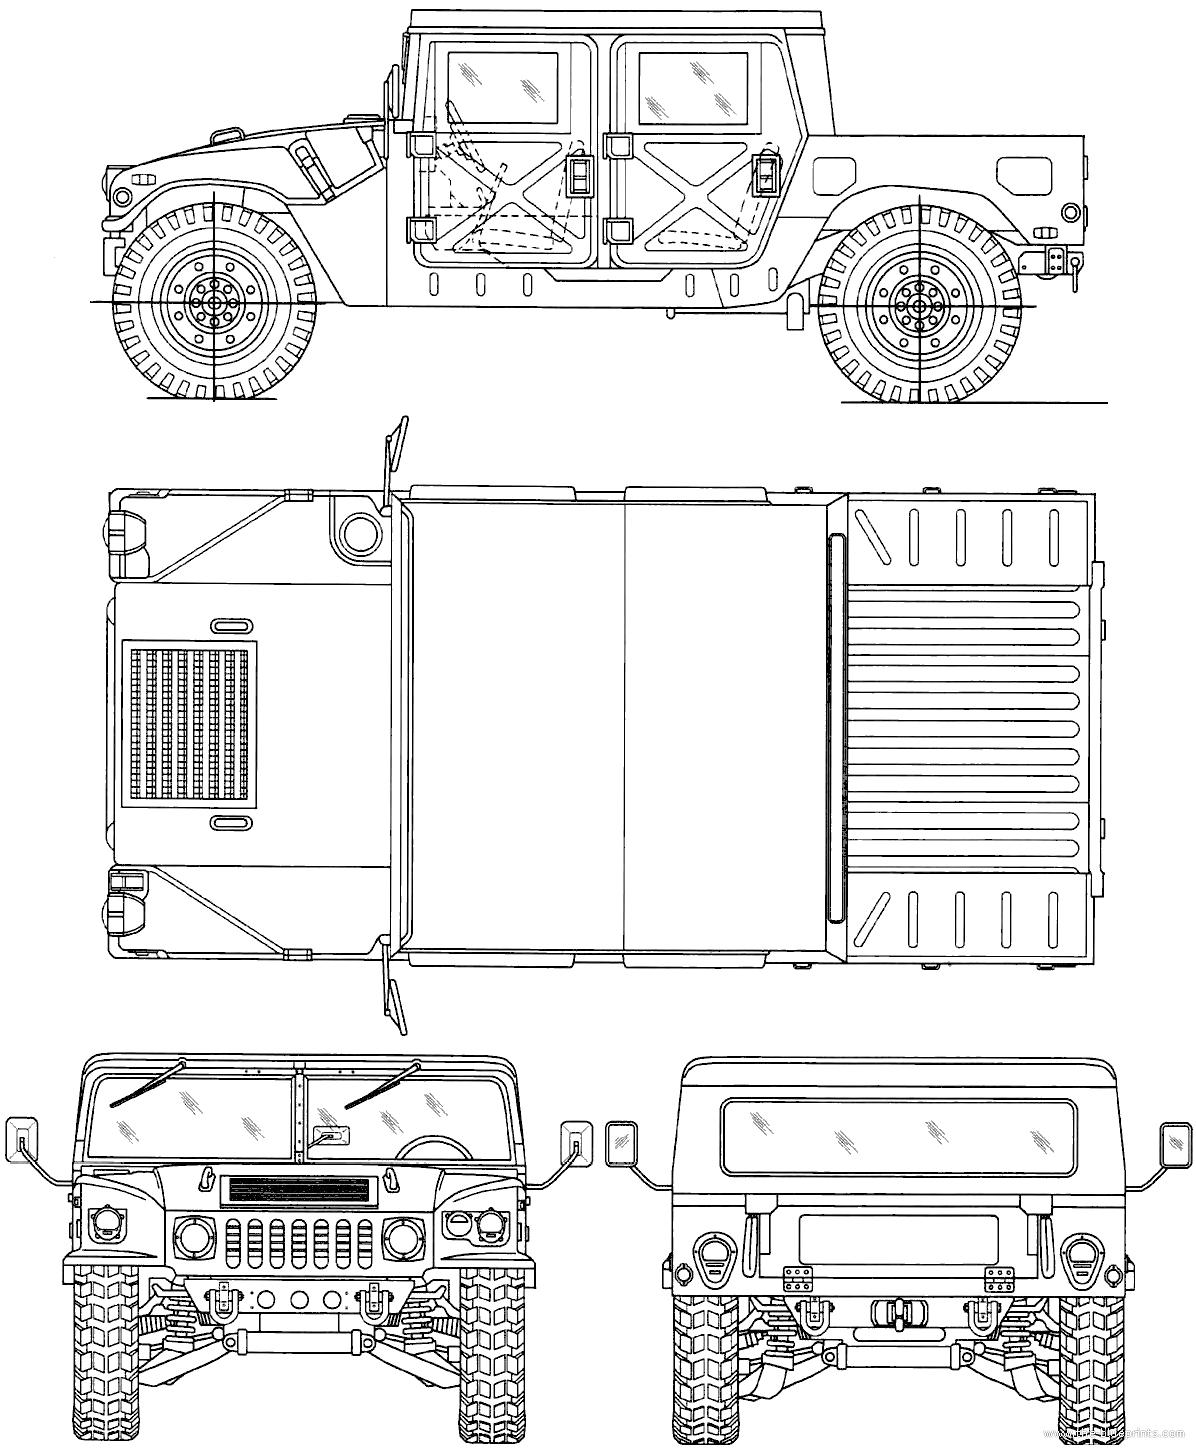 Humvee Trailer Lights Wiring Diagram Diagrams Hmmwv Engine Schematic Ward S Electric Range 7 Way